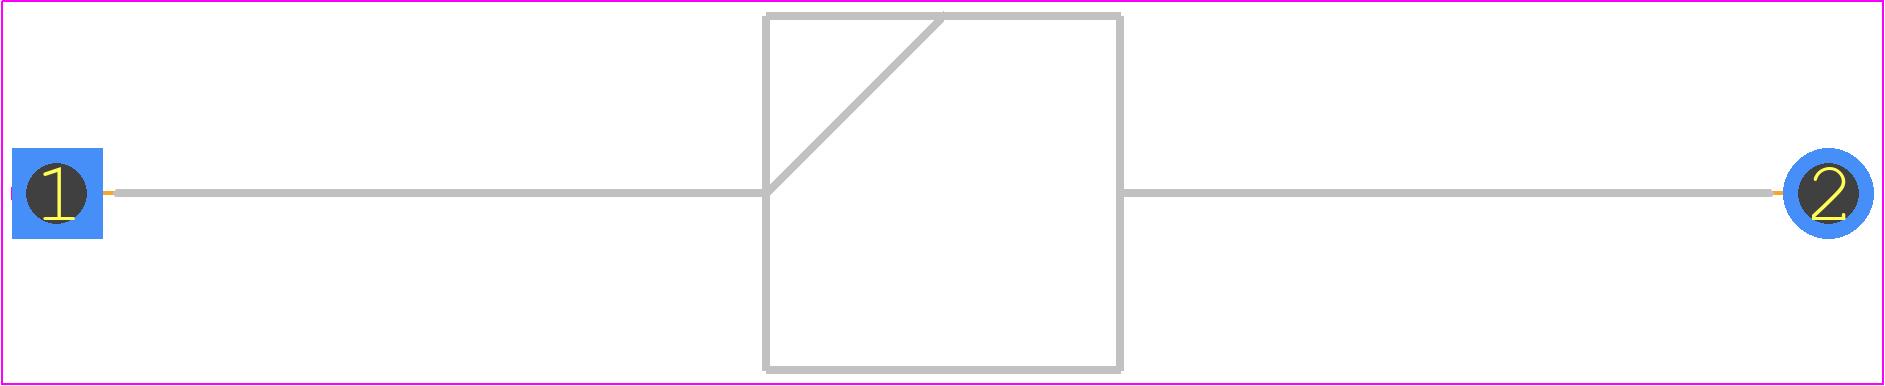 6A4-T - Diodes Inc. PCB footprint - Diodes, Axial Diameter Horizontal Mounting - R-6